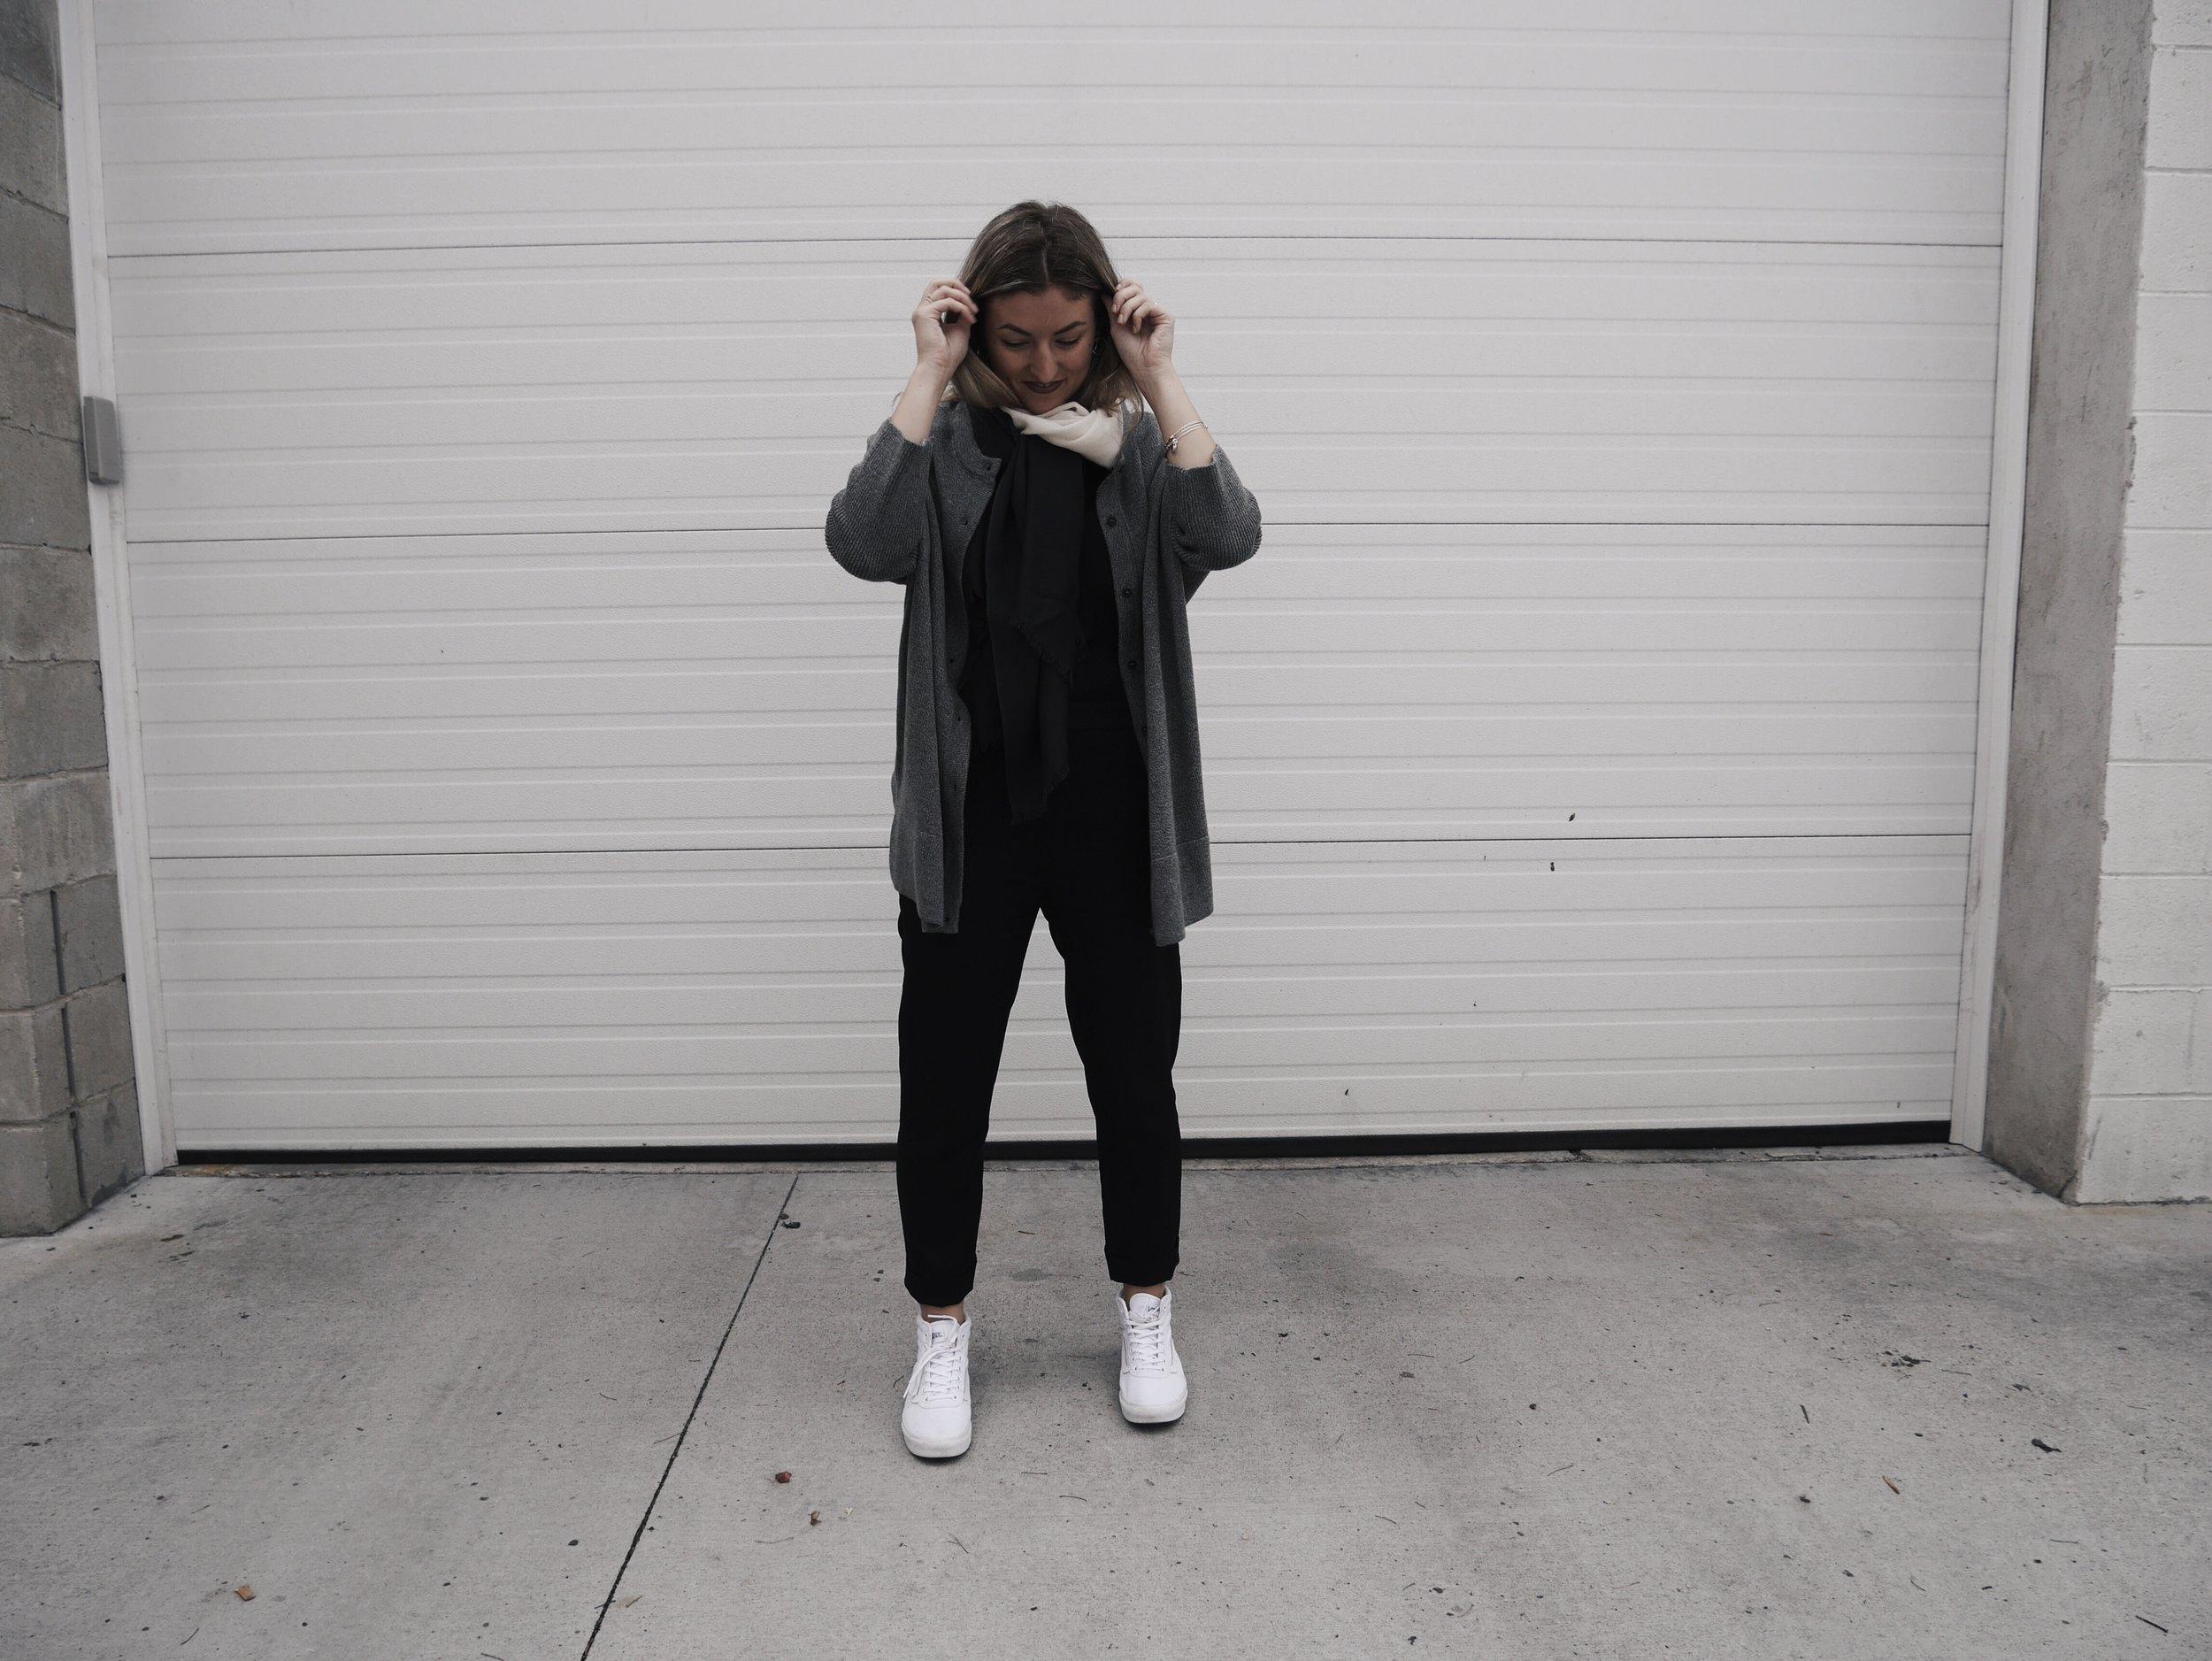 Jessica-Lambi-Fall-Fashion-Inspo.jpg